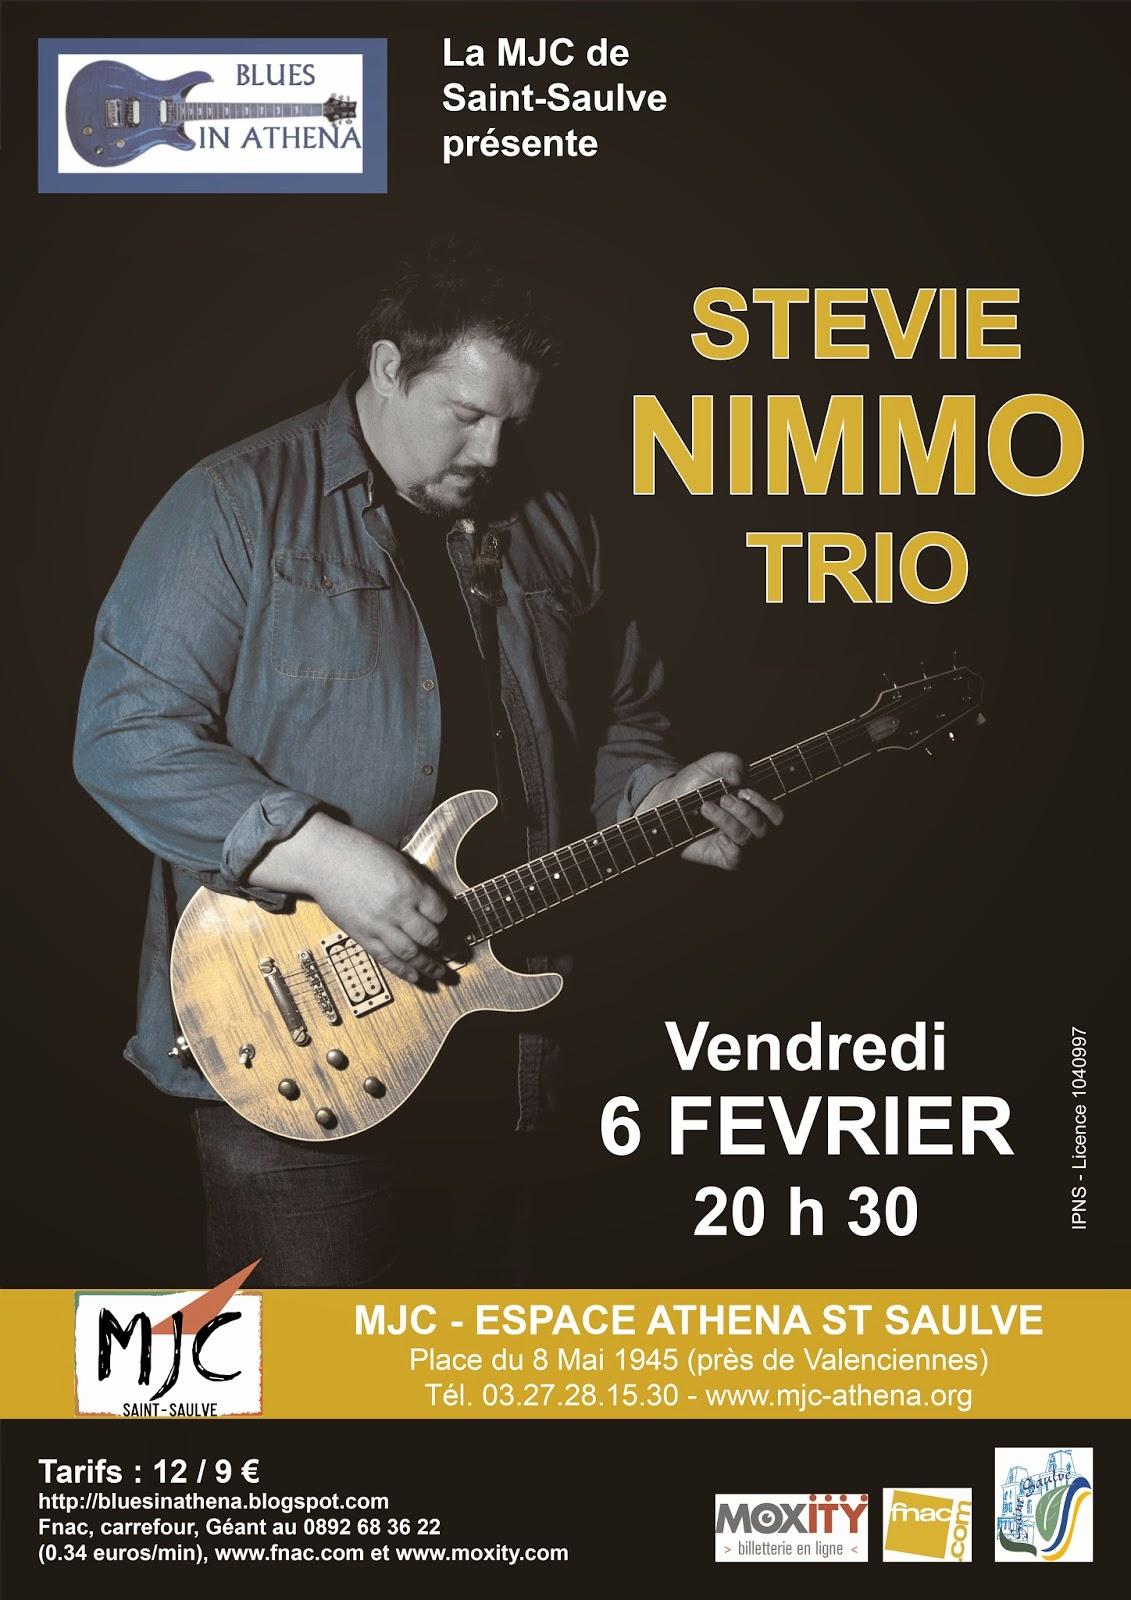 http://bluesinathena.blogspot.fr/2015/01/stevie-nimmo-trio-vendredi-6-fevrier.html